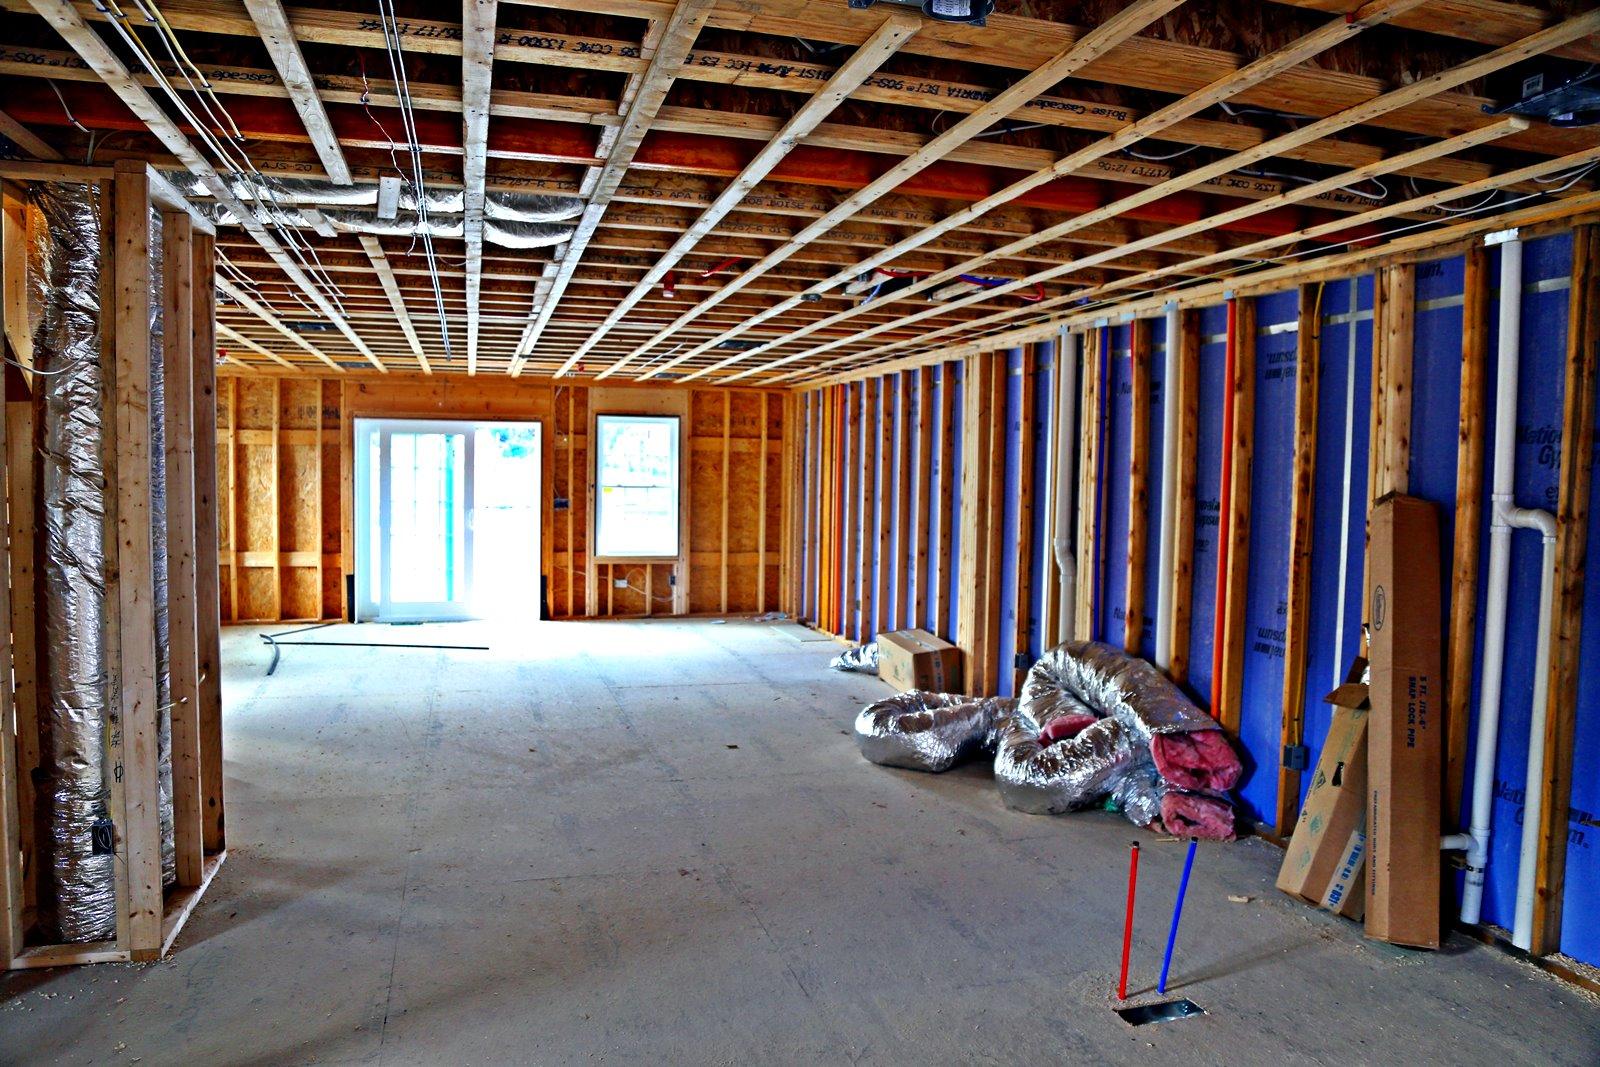 Construction, interior